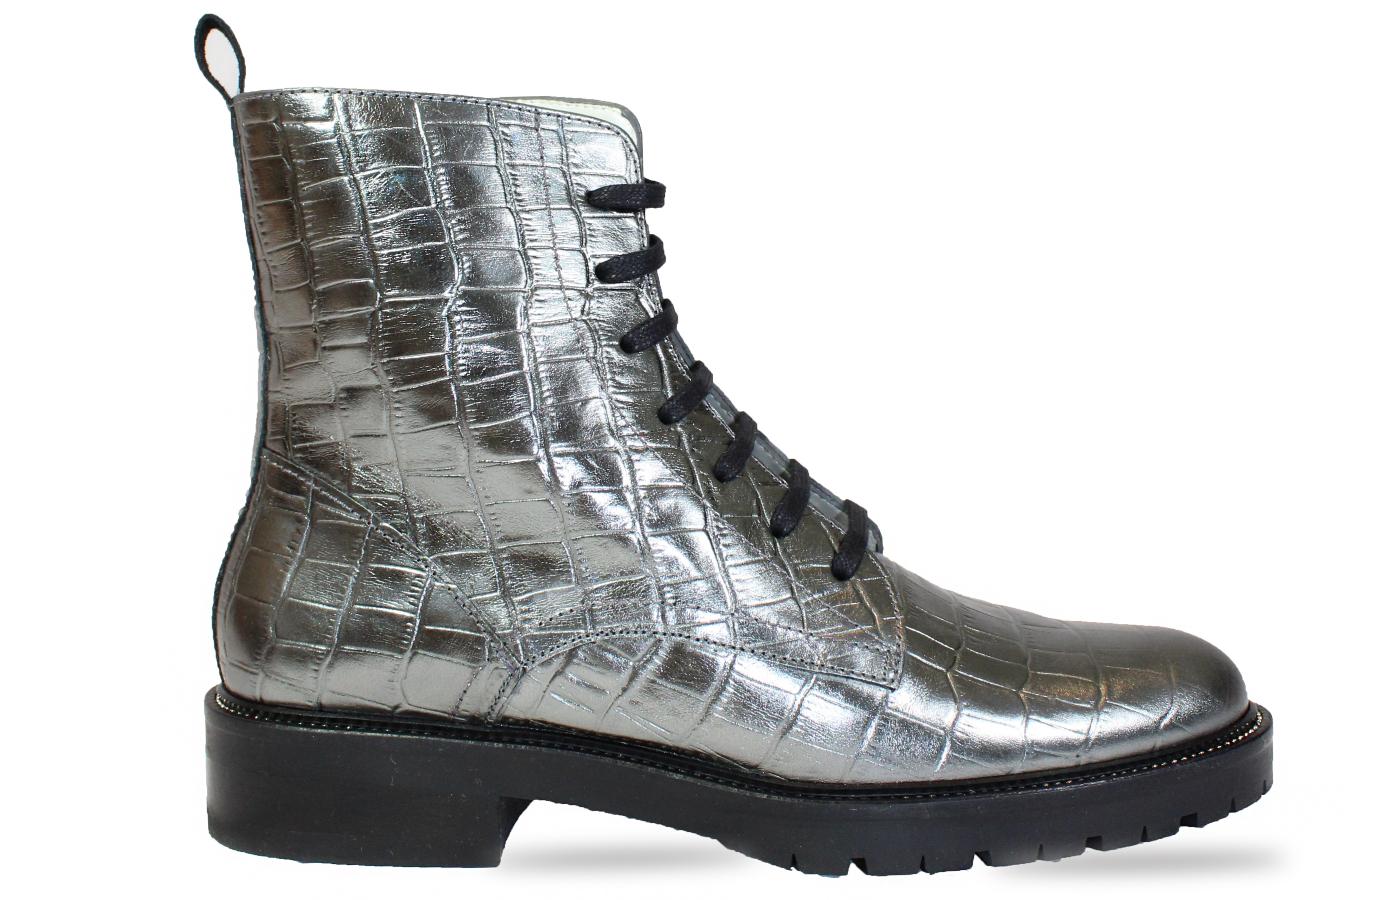 Festival Boot in metallic silver